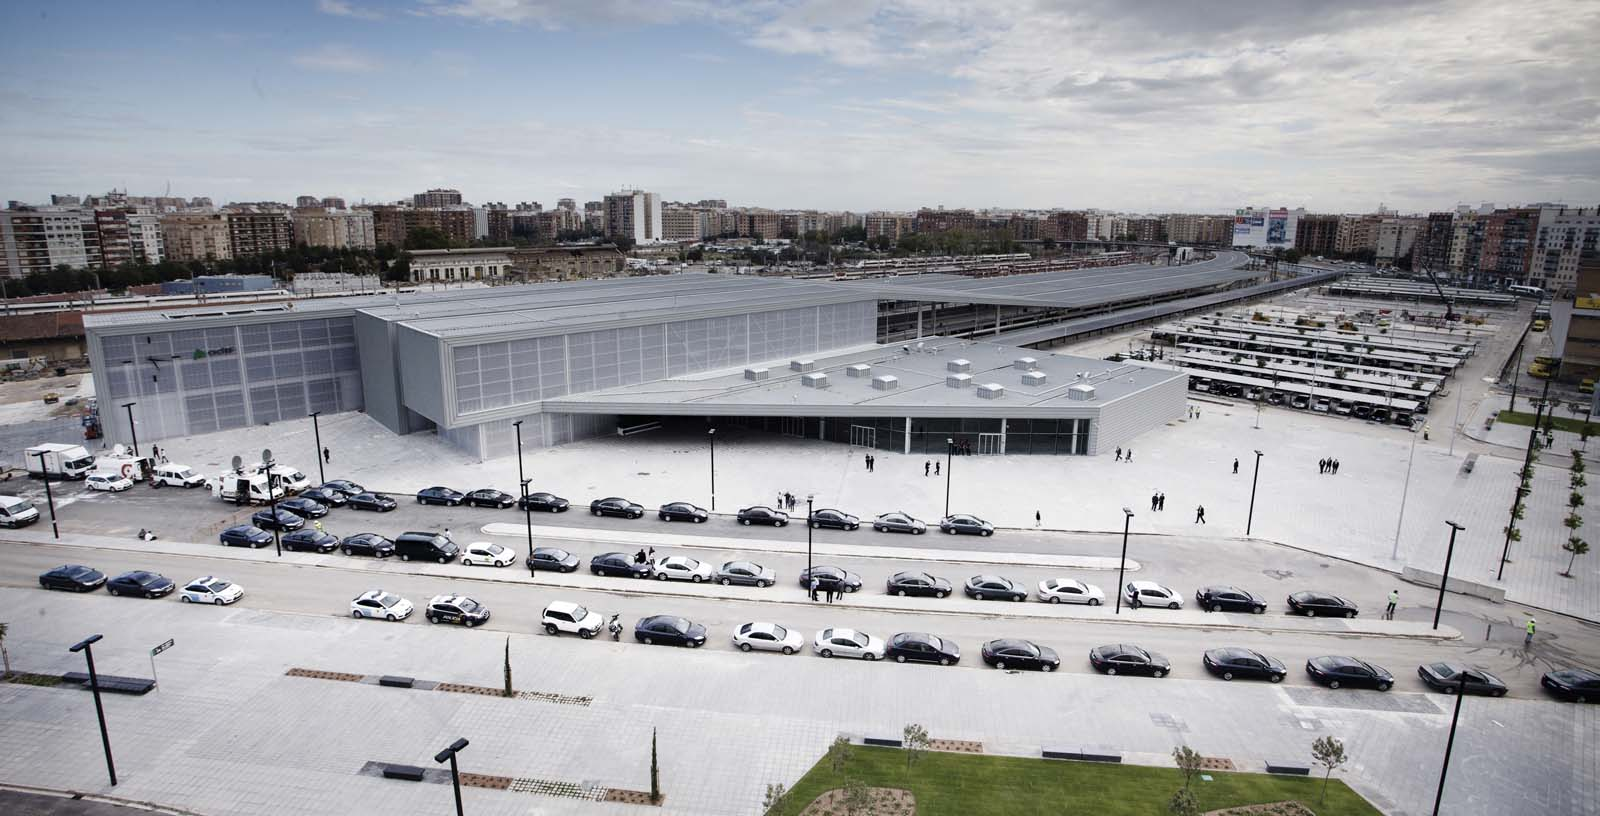 Joaquin_Sorolla_Station_01_Architecture_IDOM_photos_Alfonso_Calza